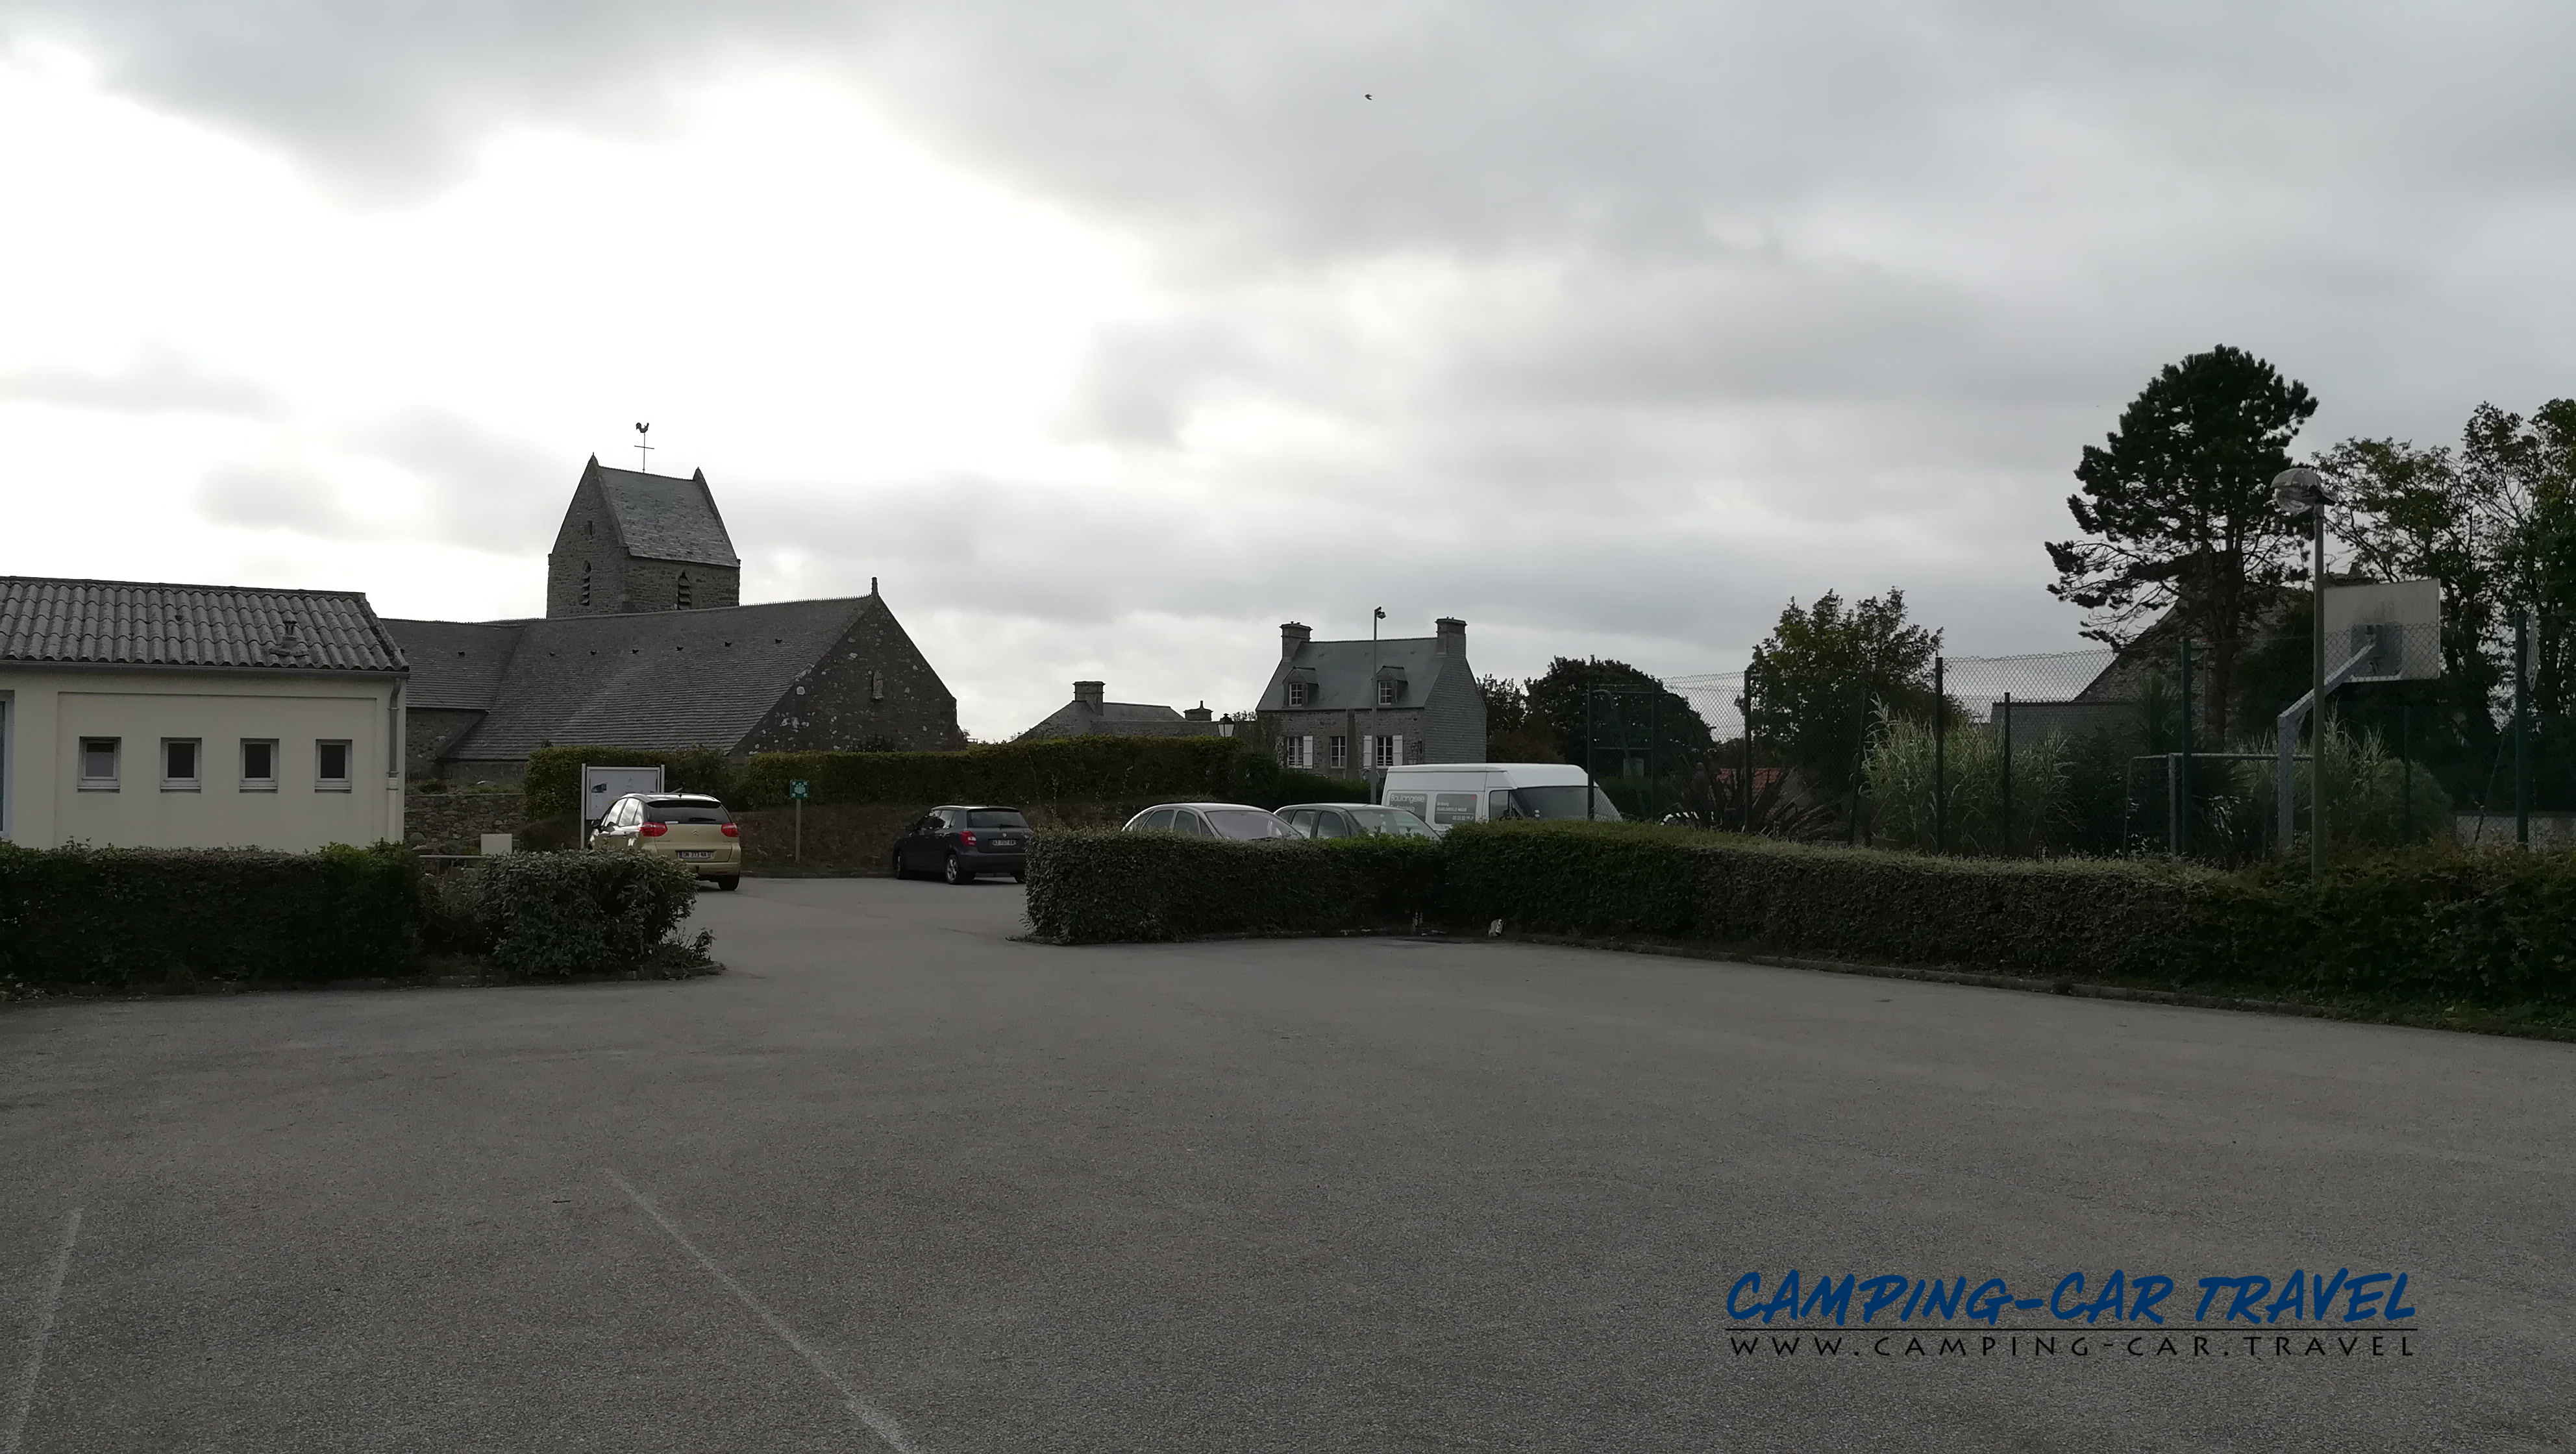 aire services camping car Greville-Hague Manche Normandie